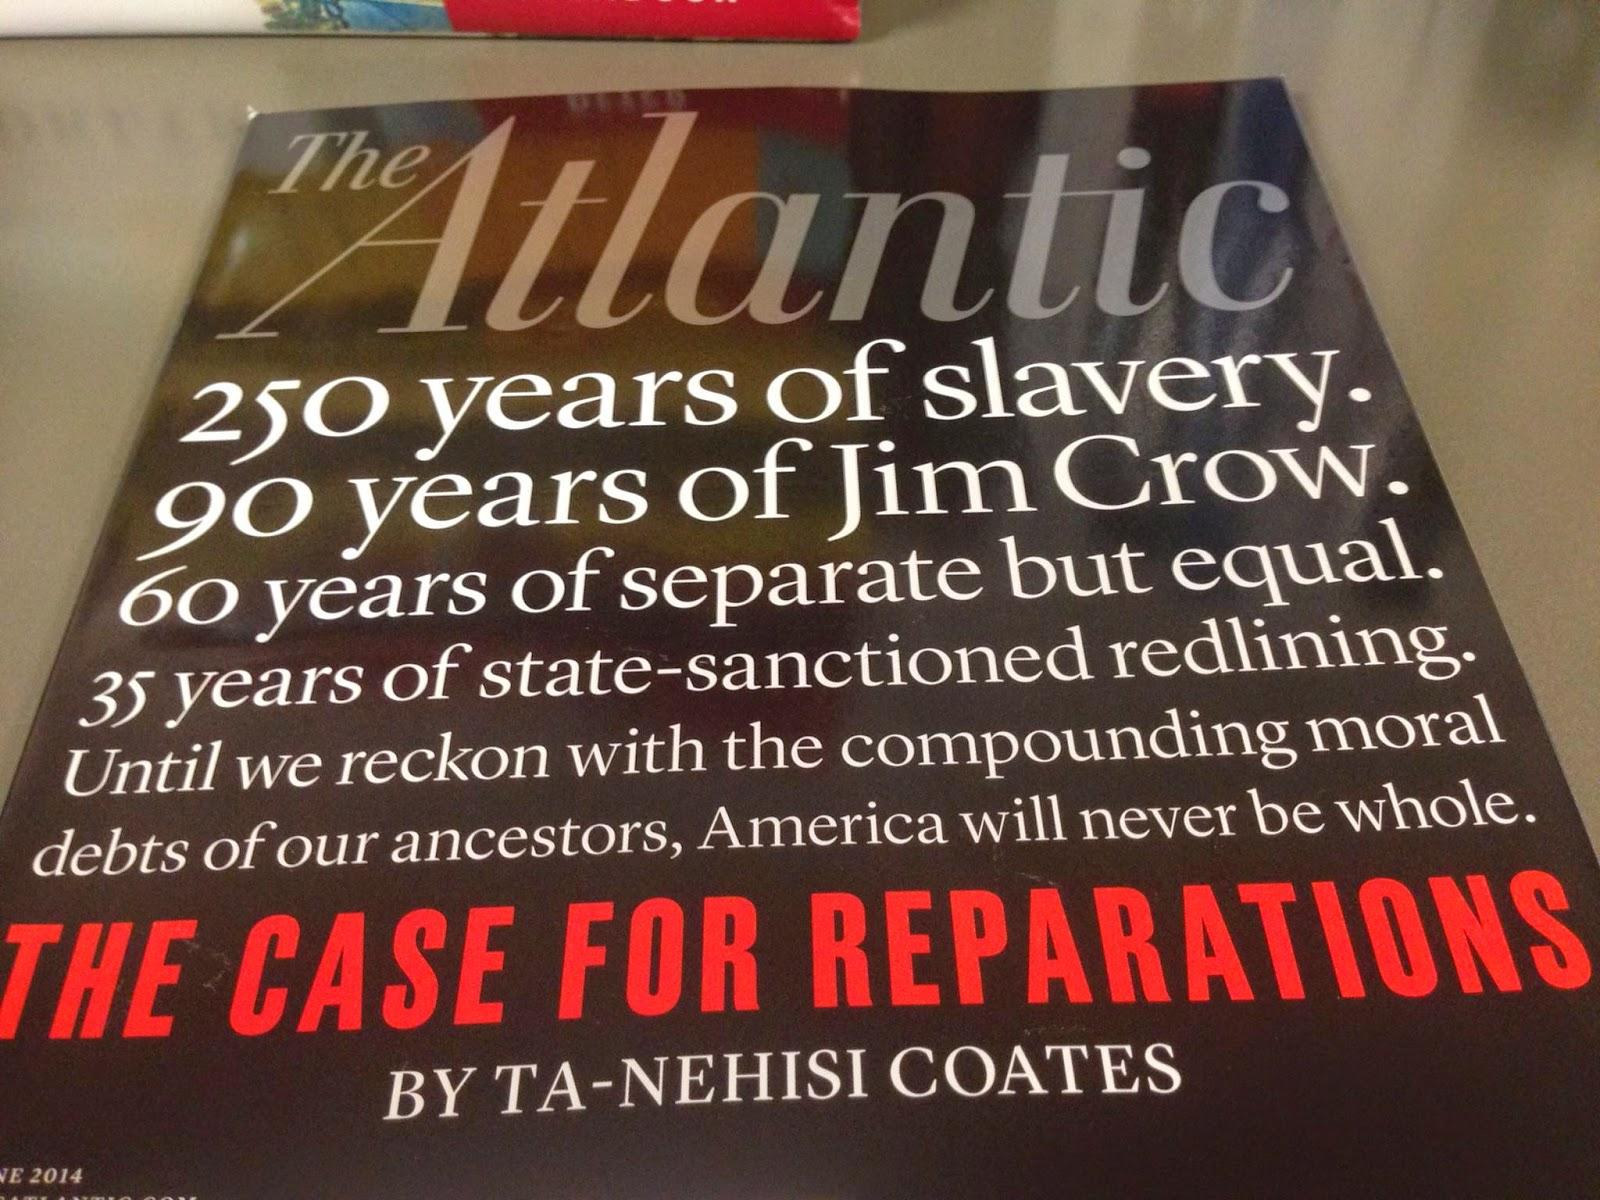 apartheid, Jim Crow, reconciliation, reparations, slavery, African-American, Native American